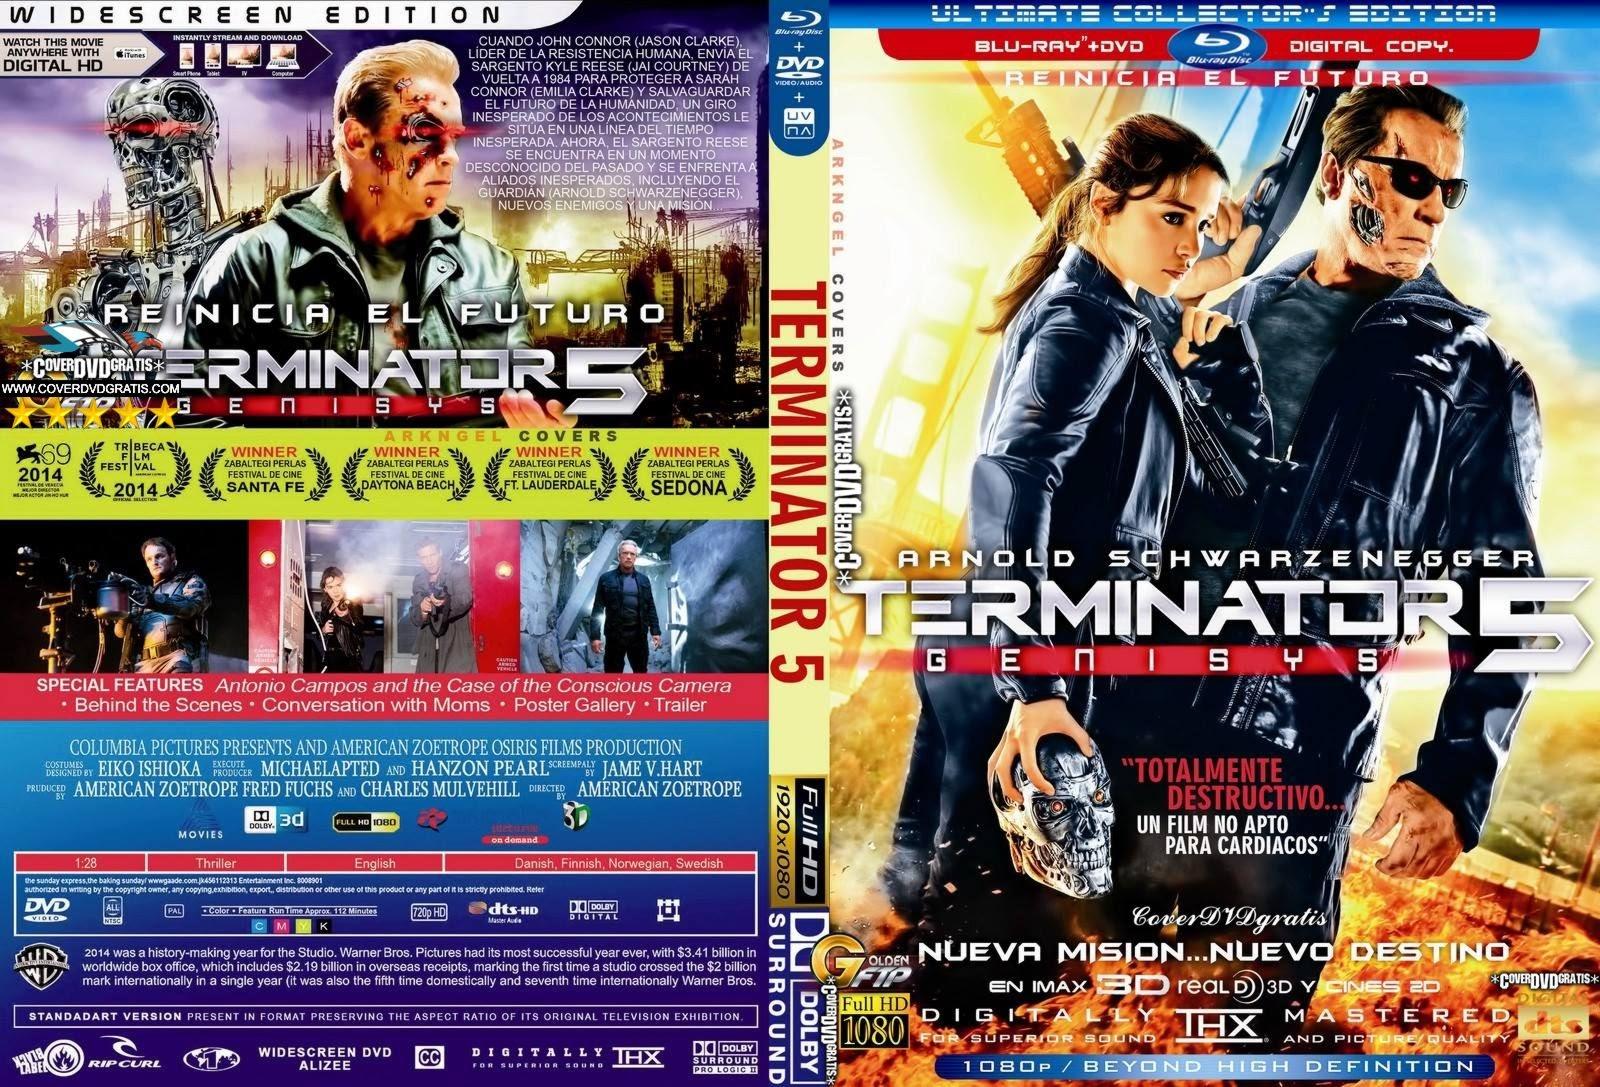 Terminator Genisys (English) 3 full movie in english free